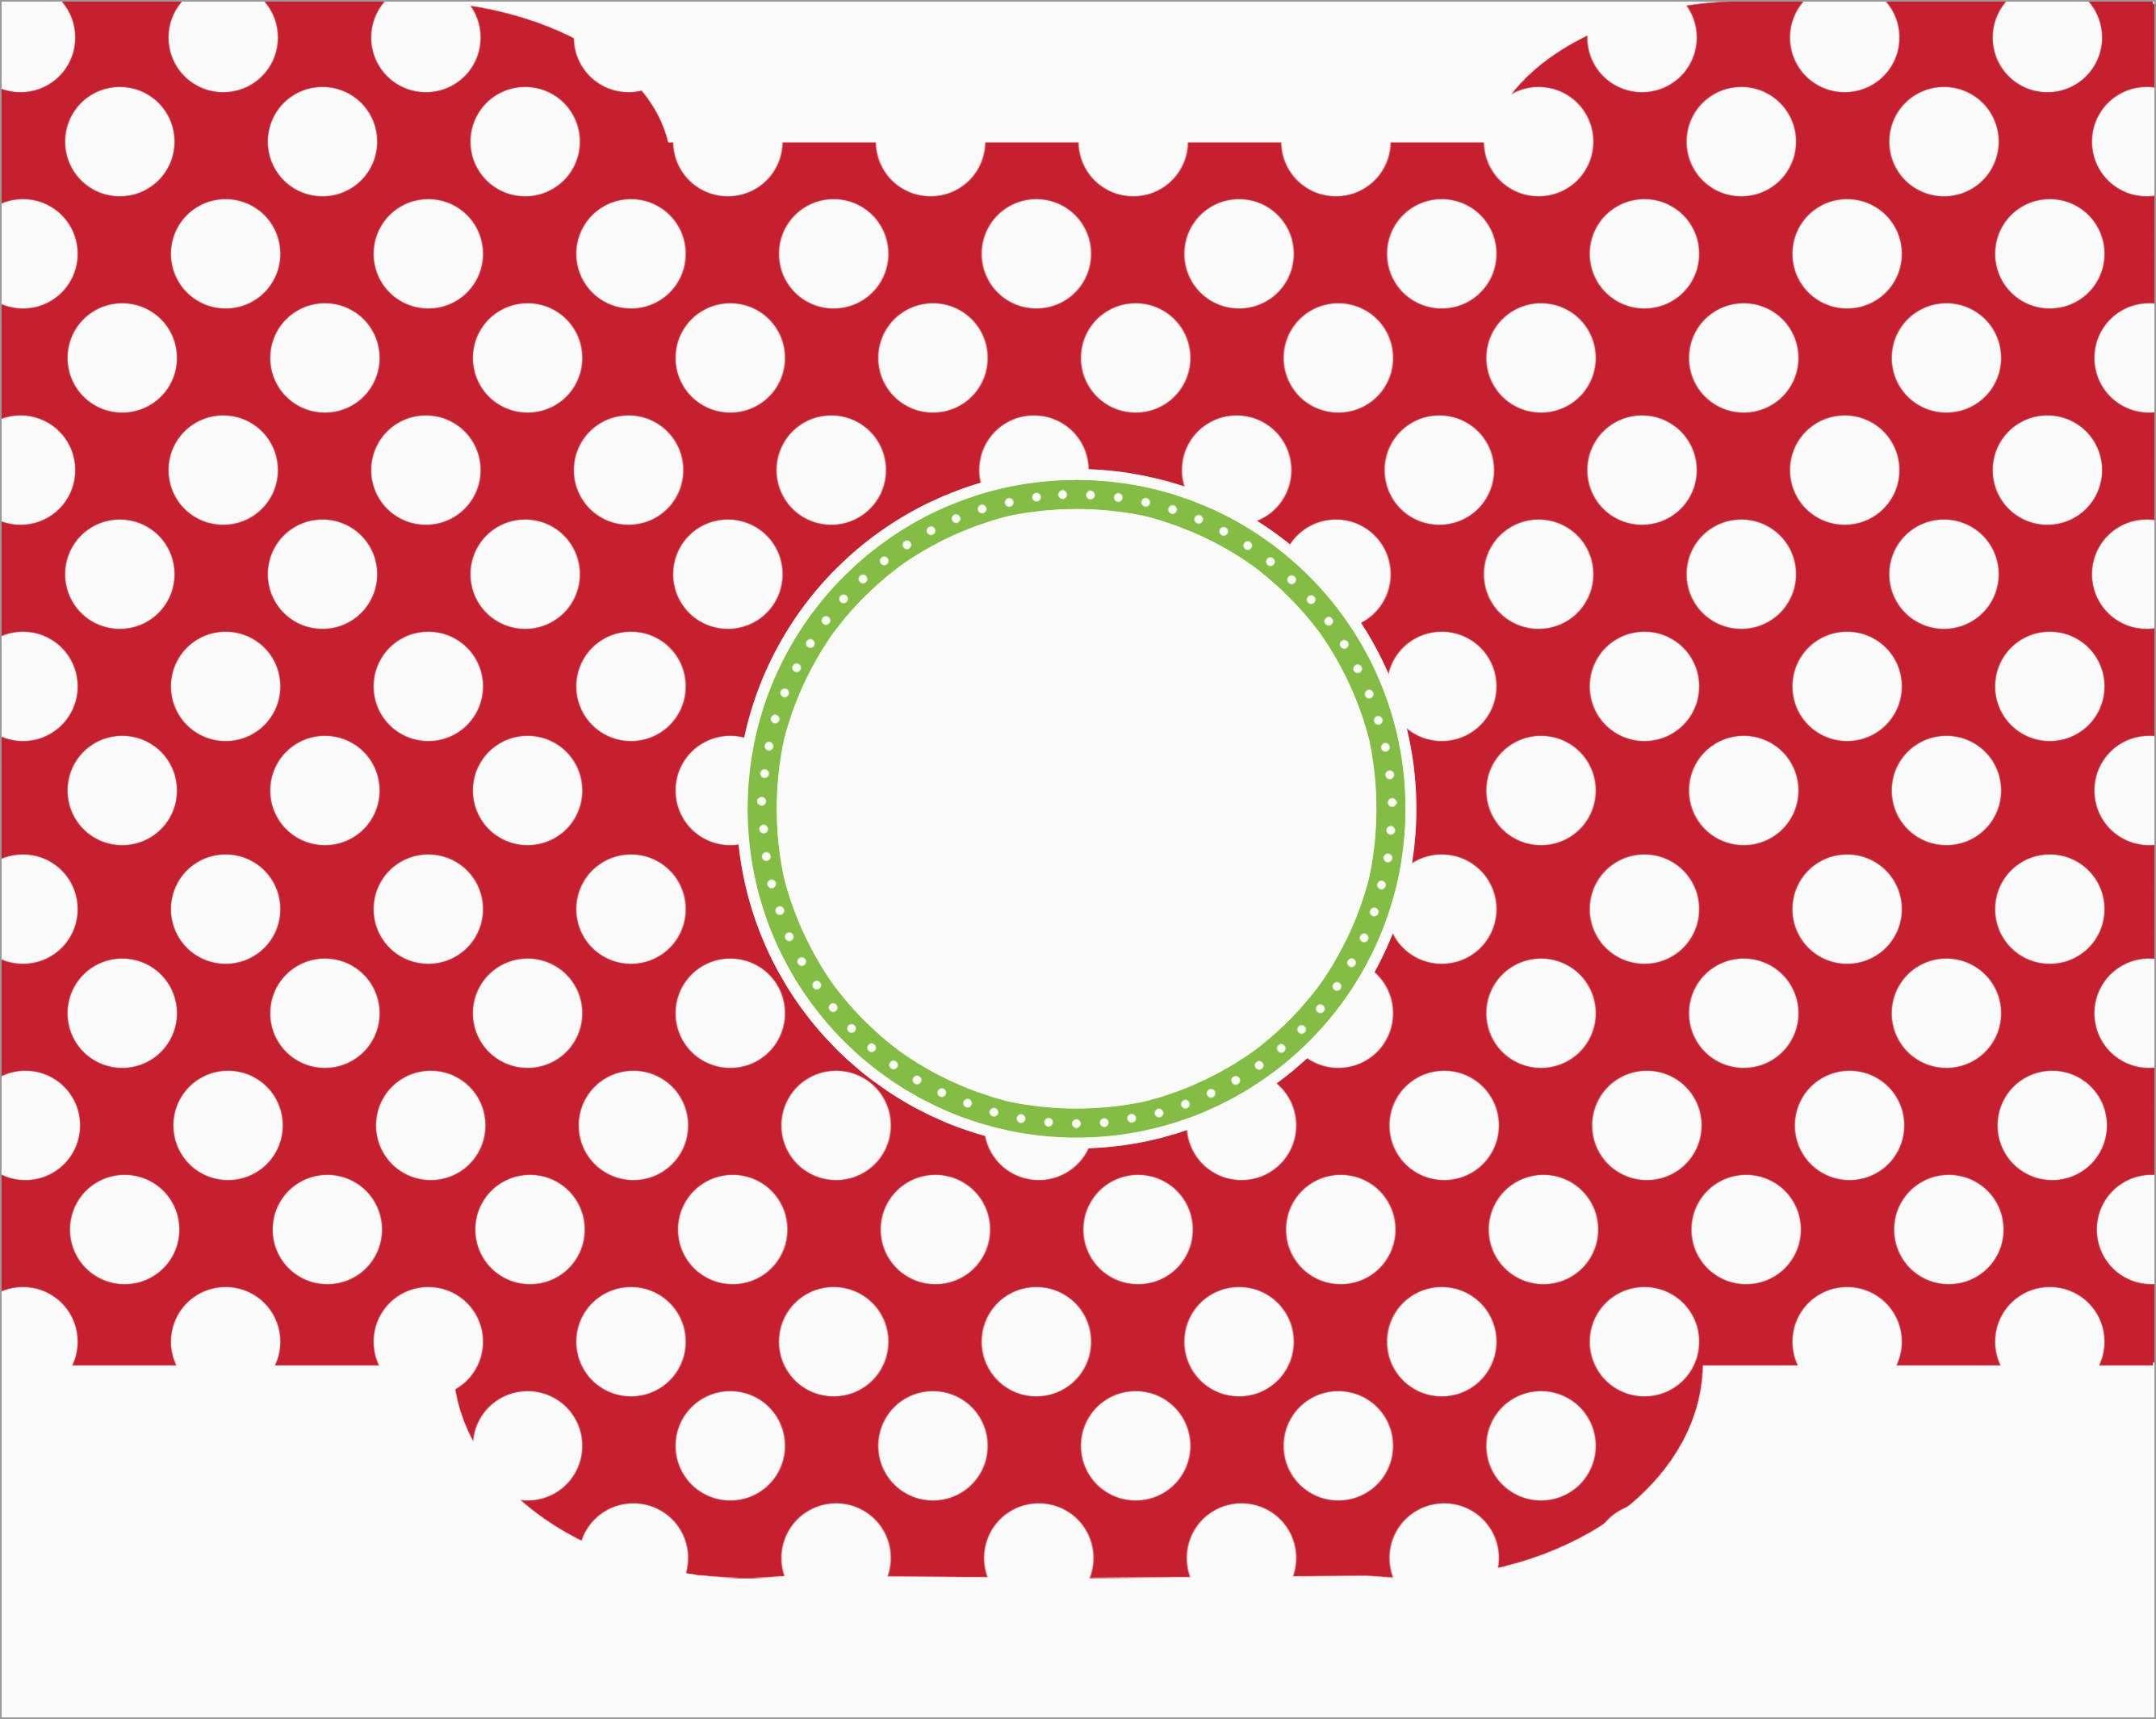 Elegant Gift Card Envelope Template Free   Best Of Template - Free Printable Gift Card Envelope Template